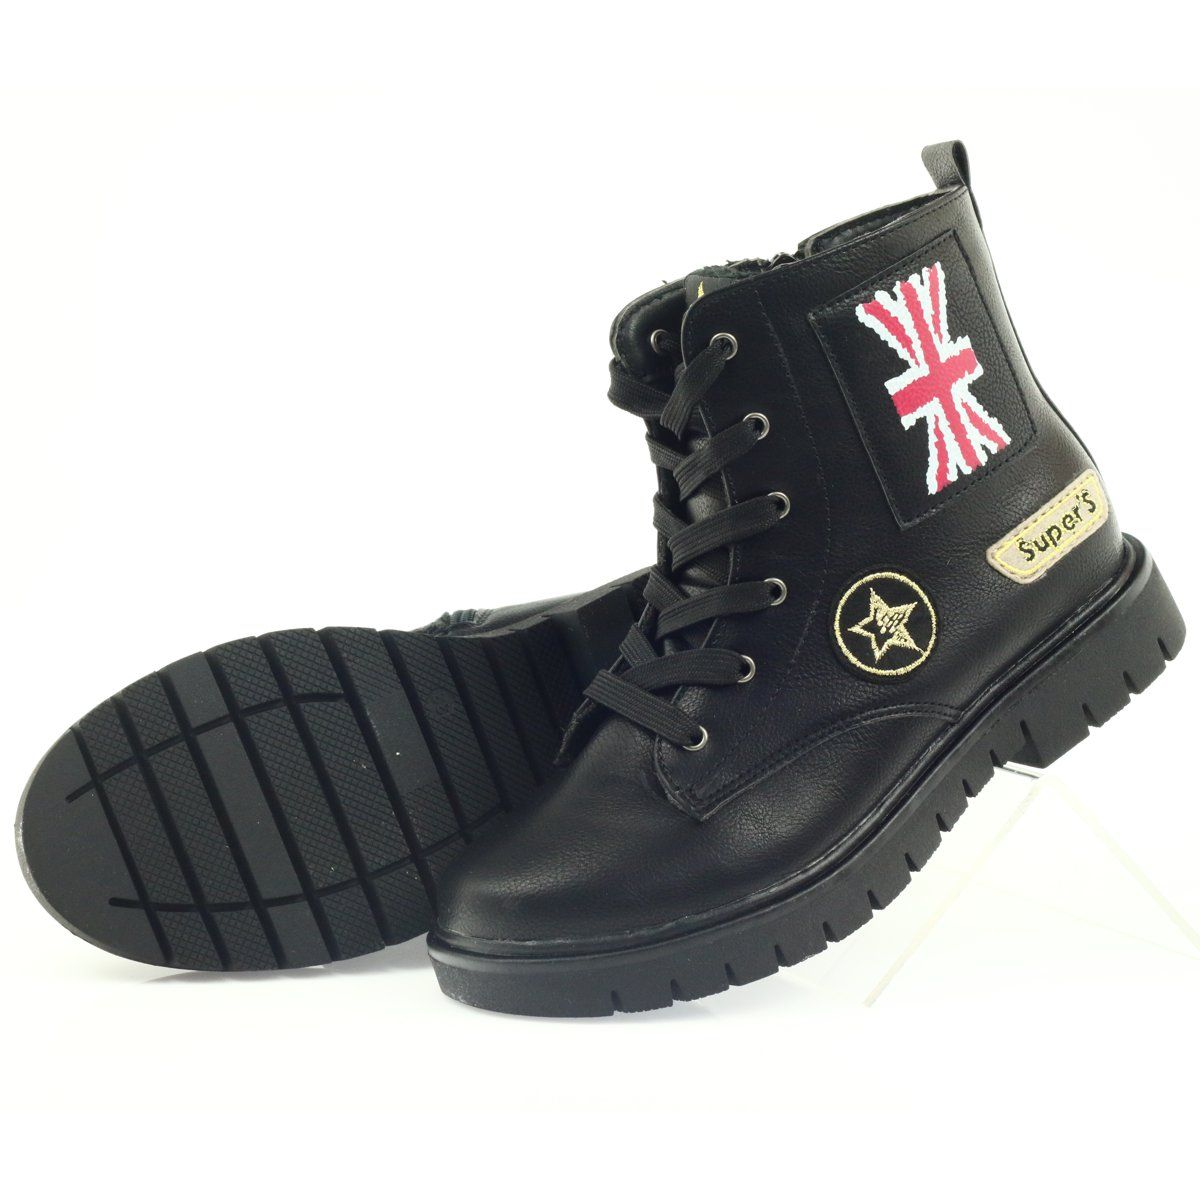 American Club American Super Workery Buty Zimowe Czarne Zolte Czerwone High Top Sneakers Shoes Top Sneakers